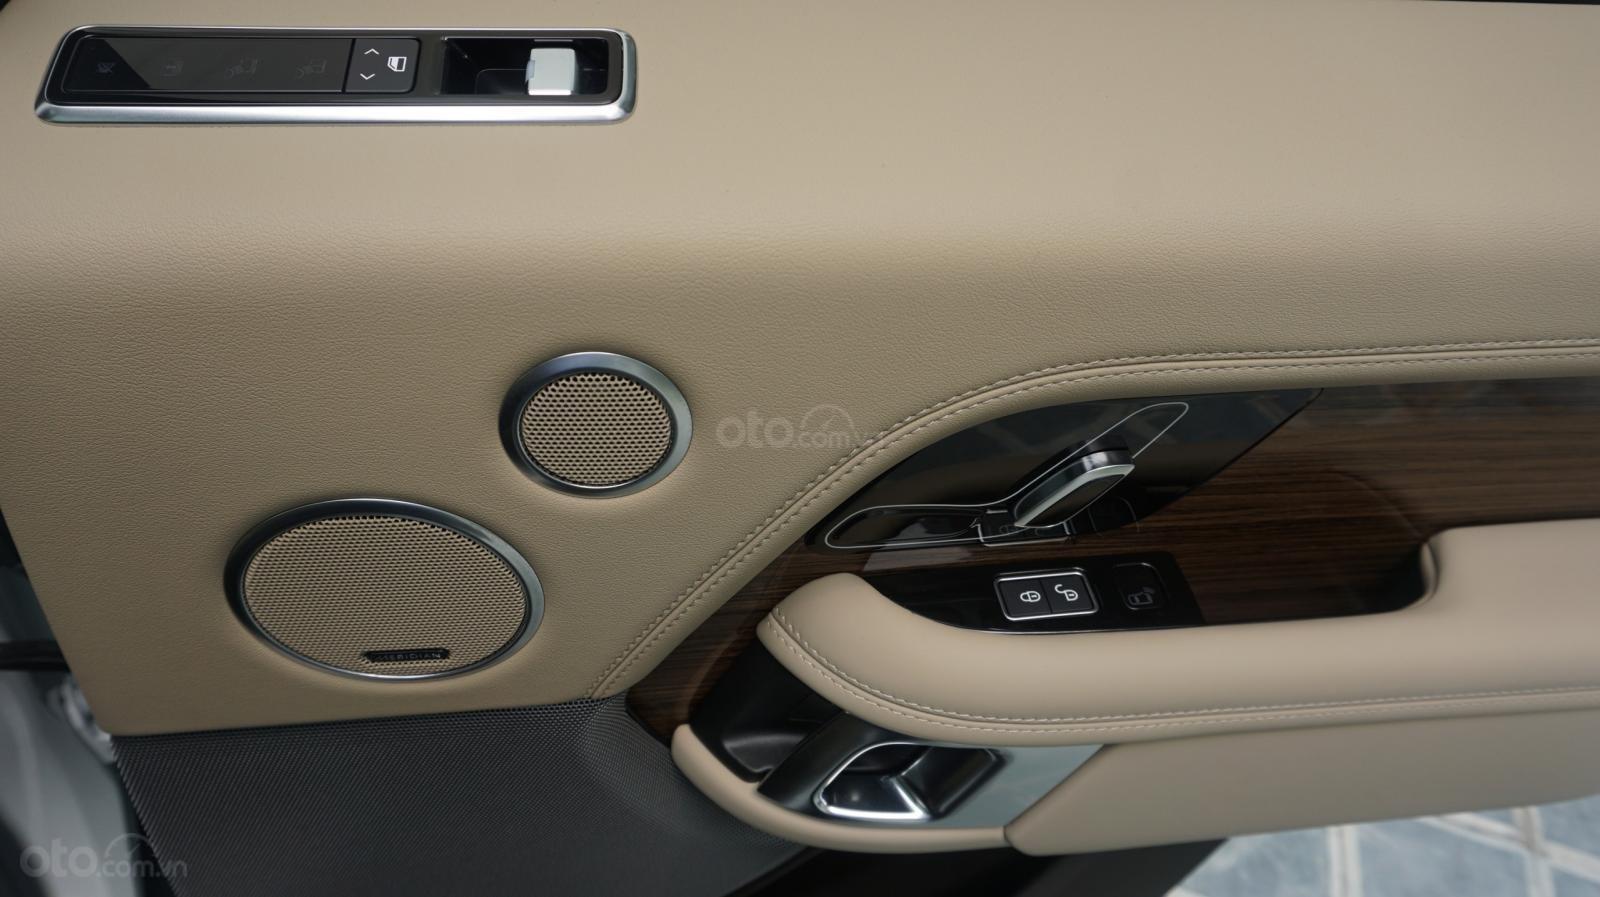 Cần bán xe LandRover Range Rover HSE năm 2019, màu trắng, xe nhập-5